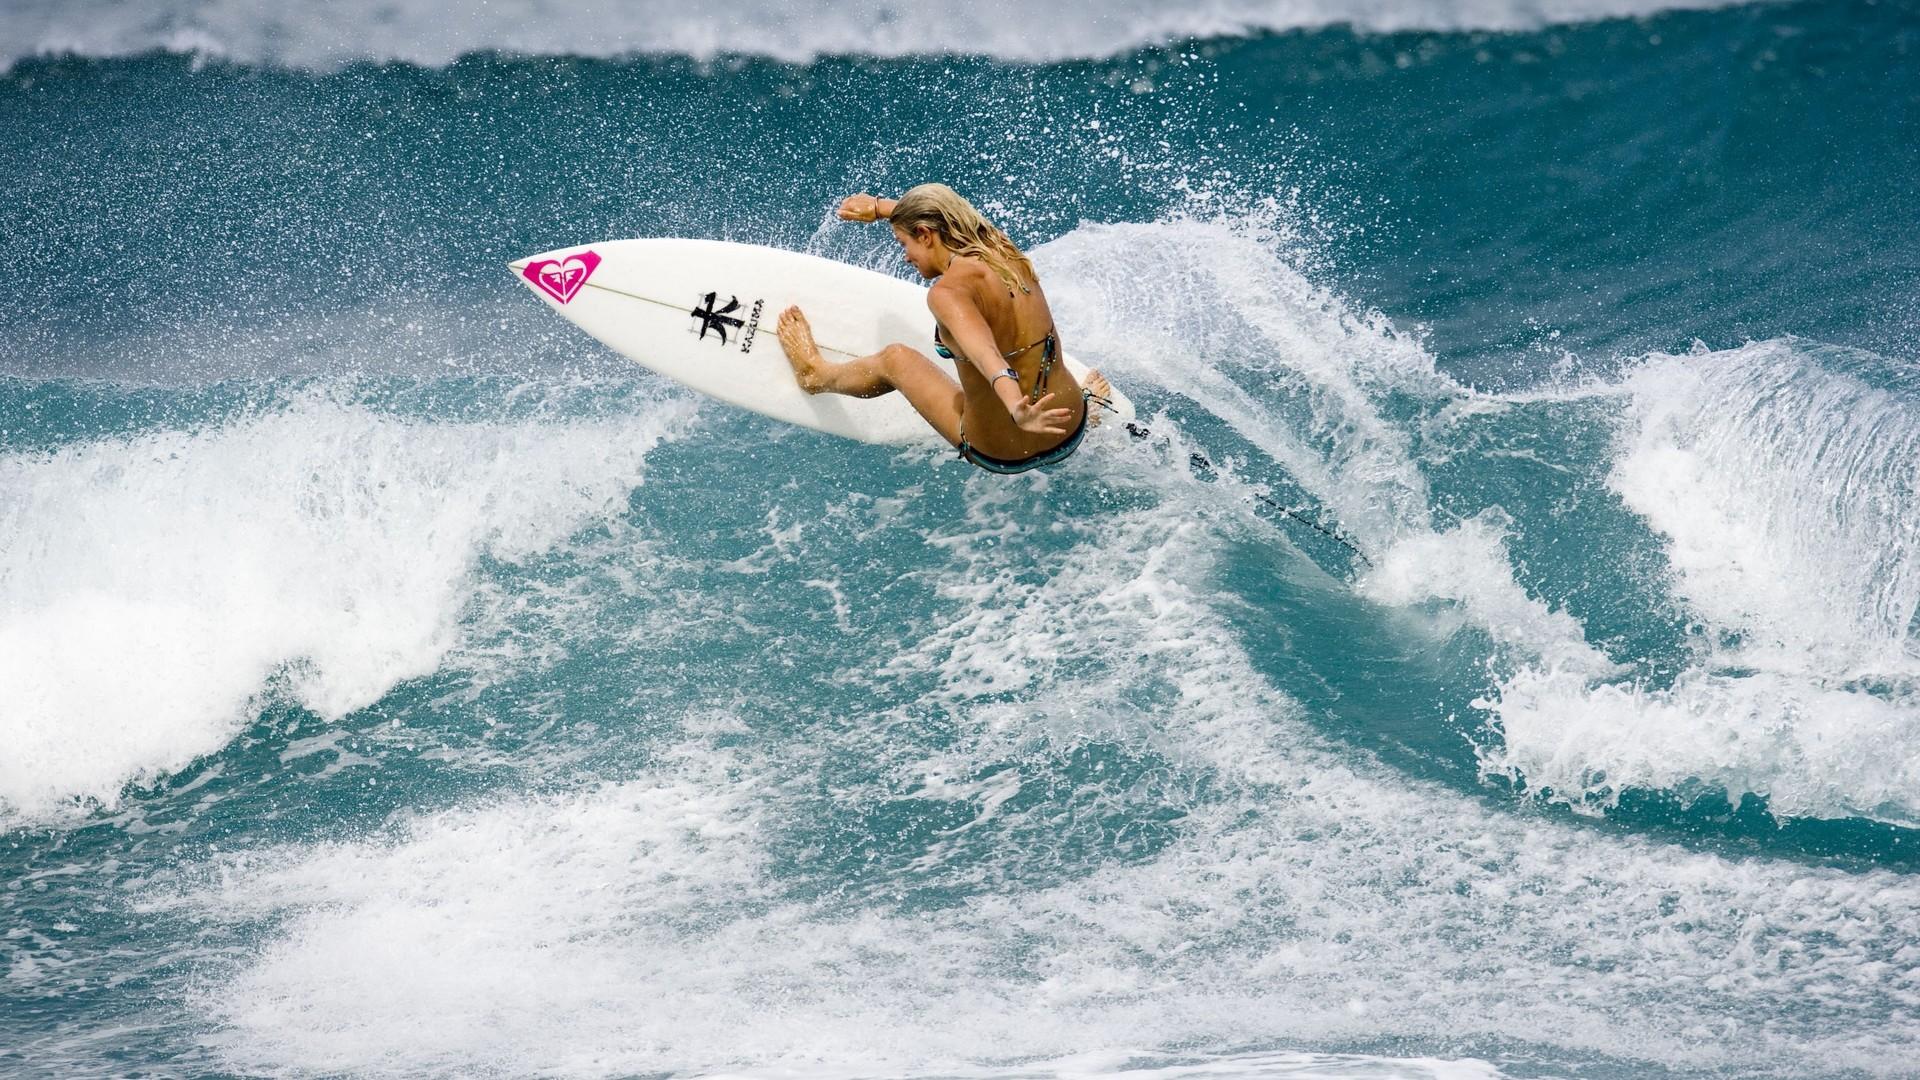 Sports – Surfing Wallpaper